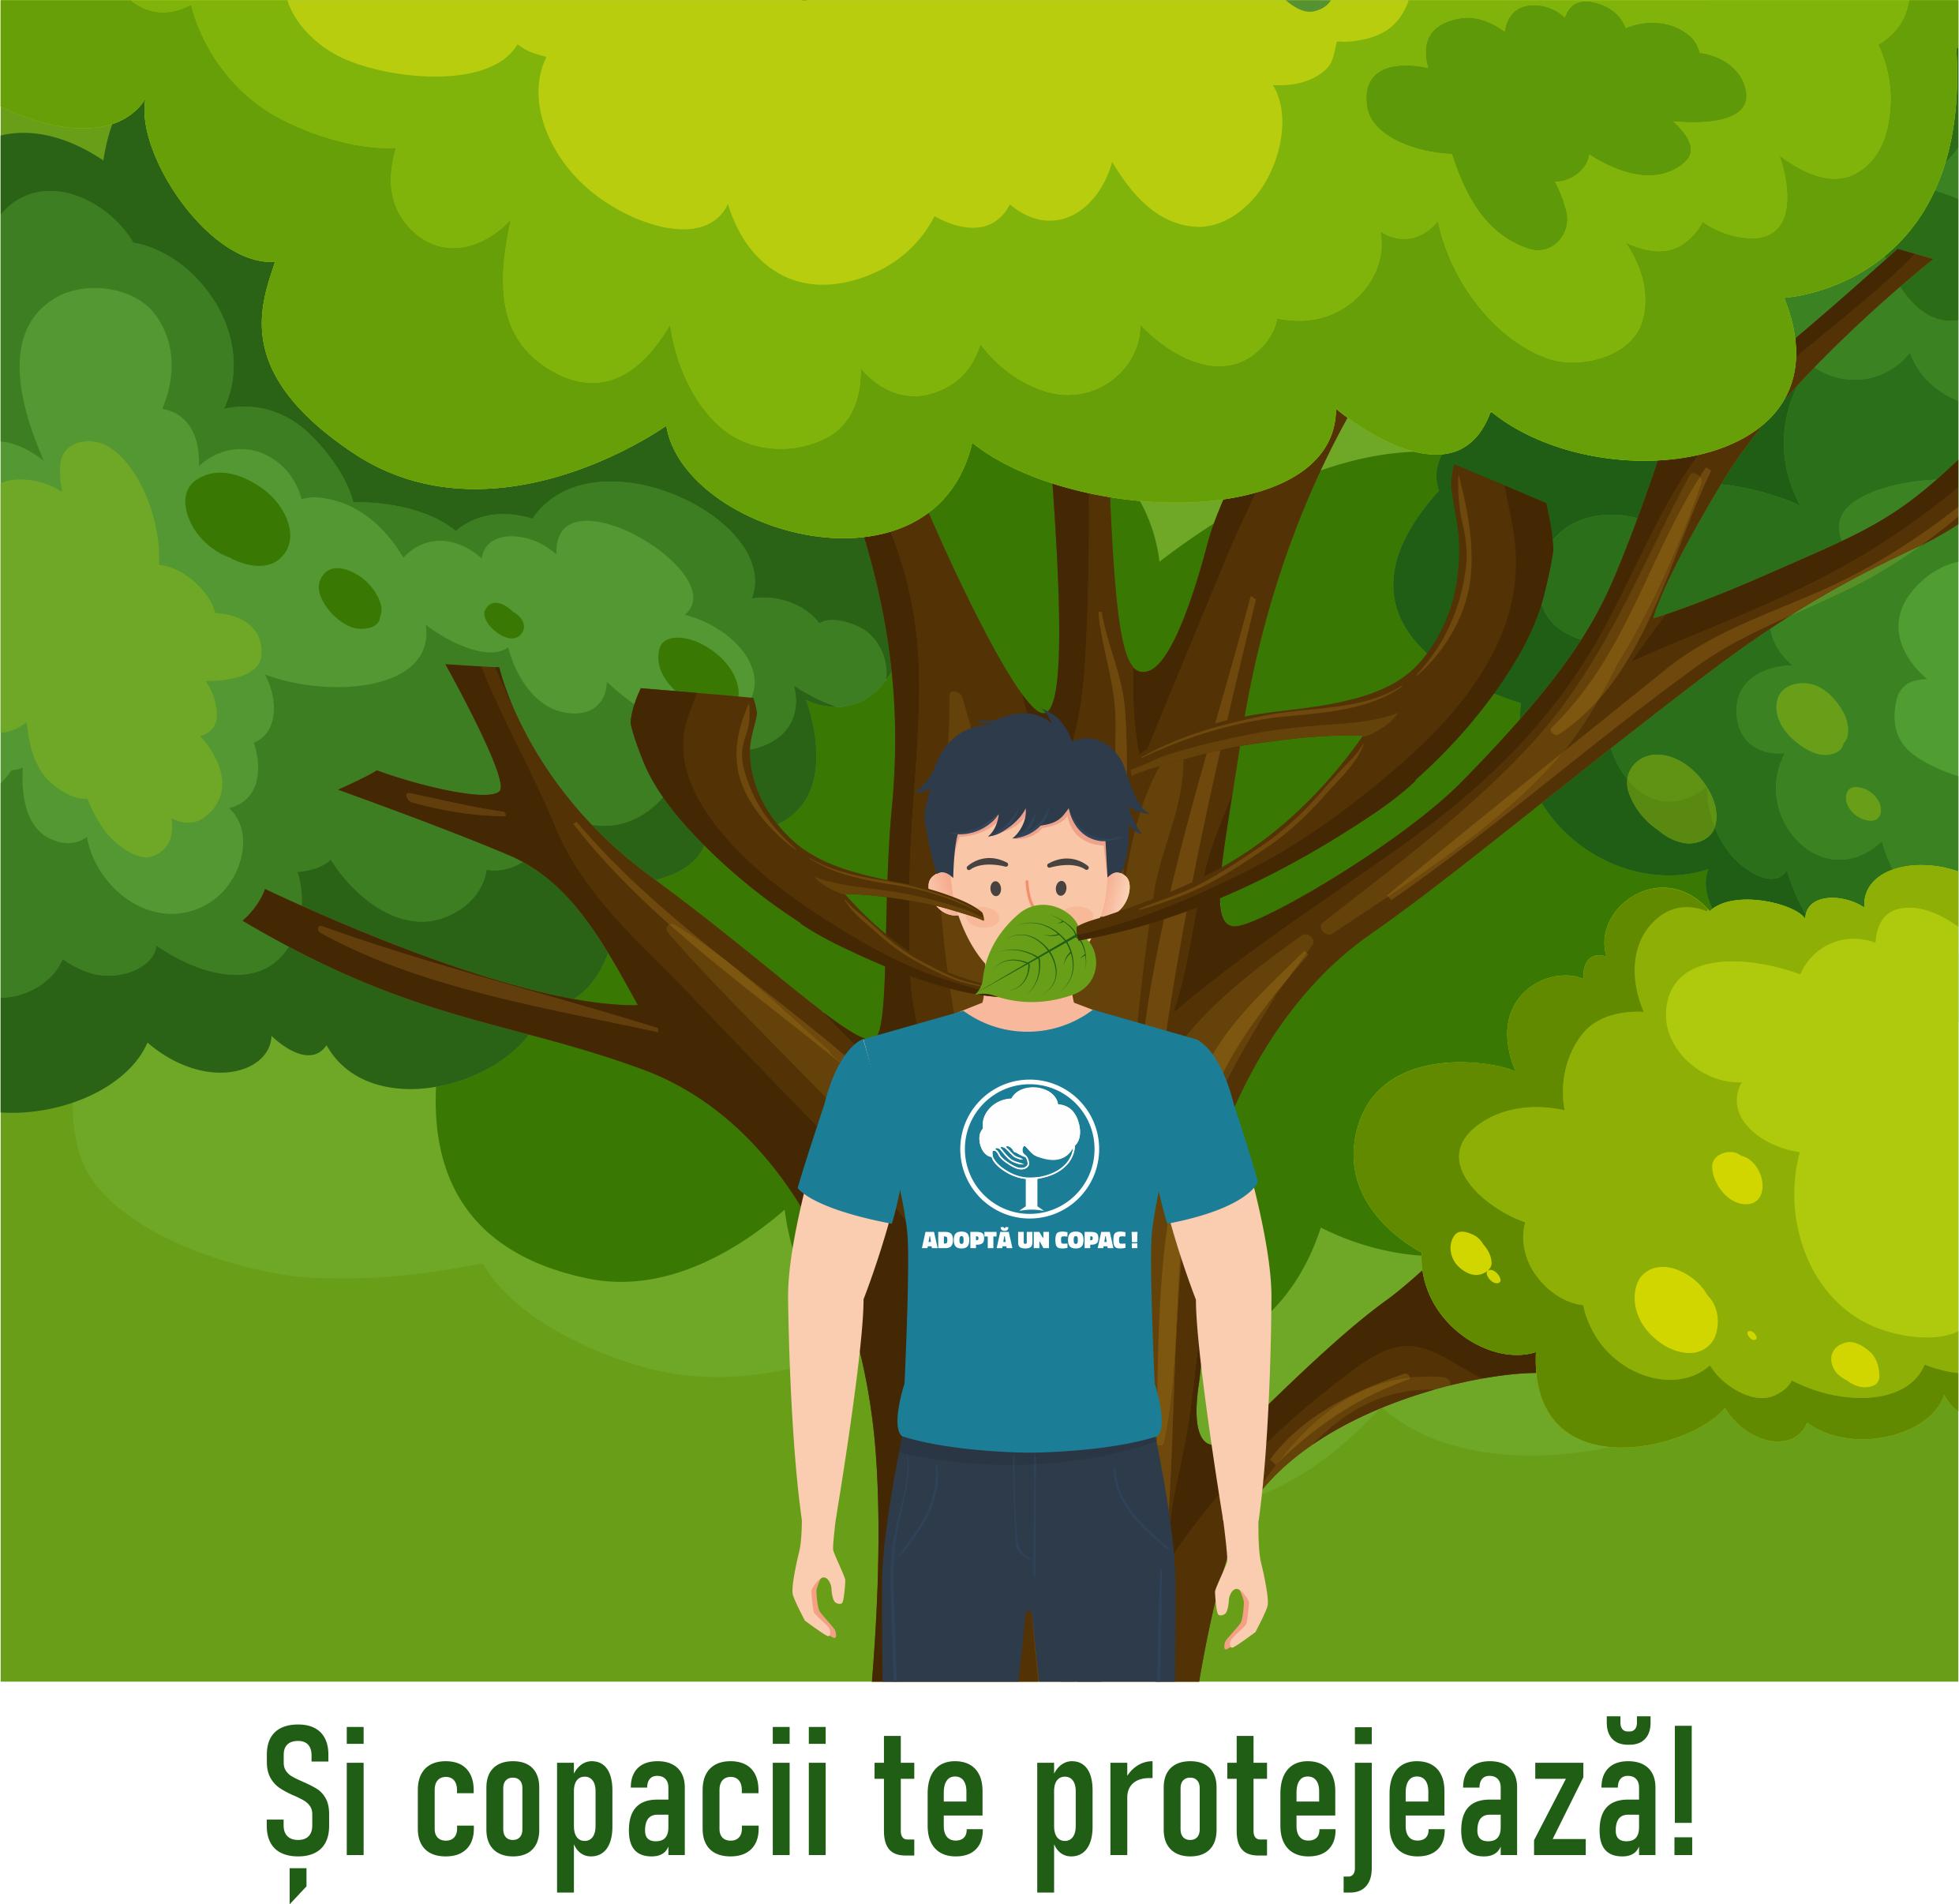 Si copacii te protejeaza